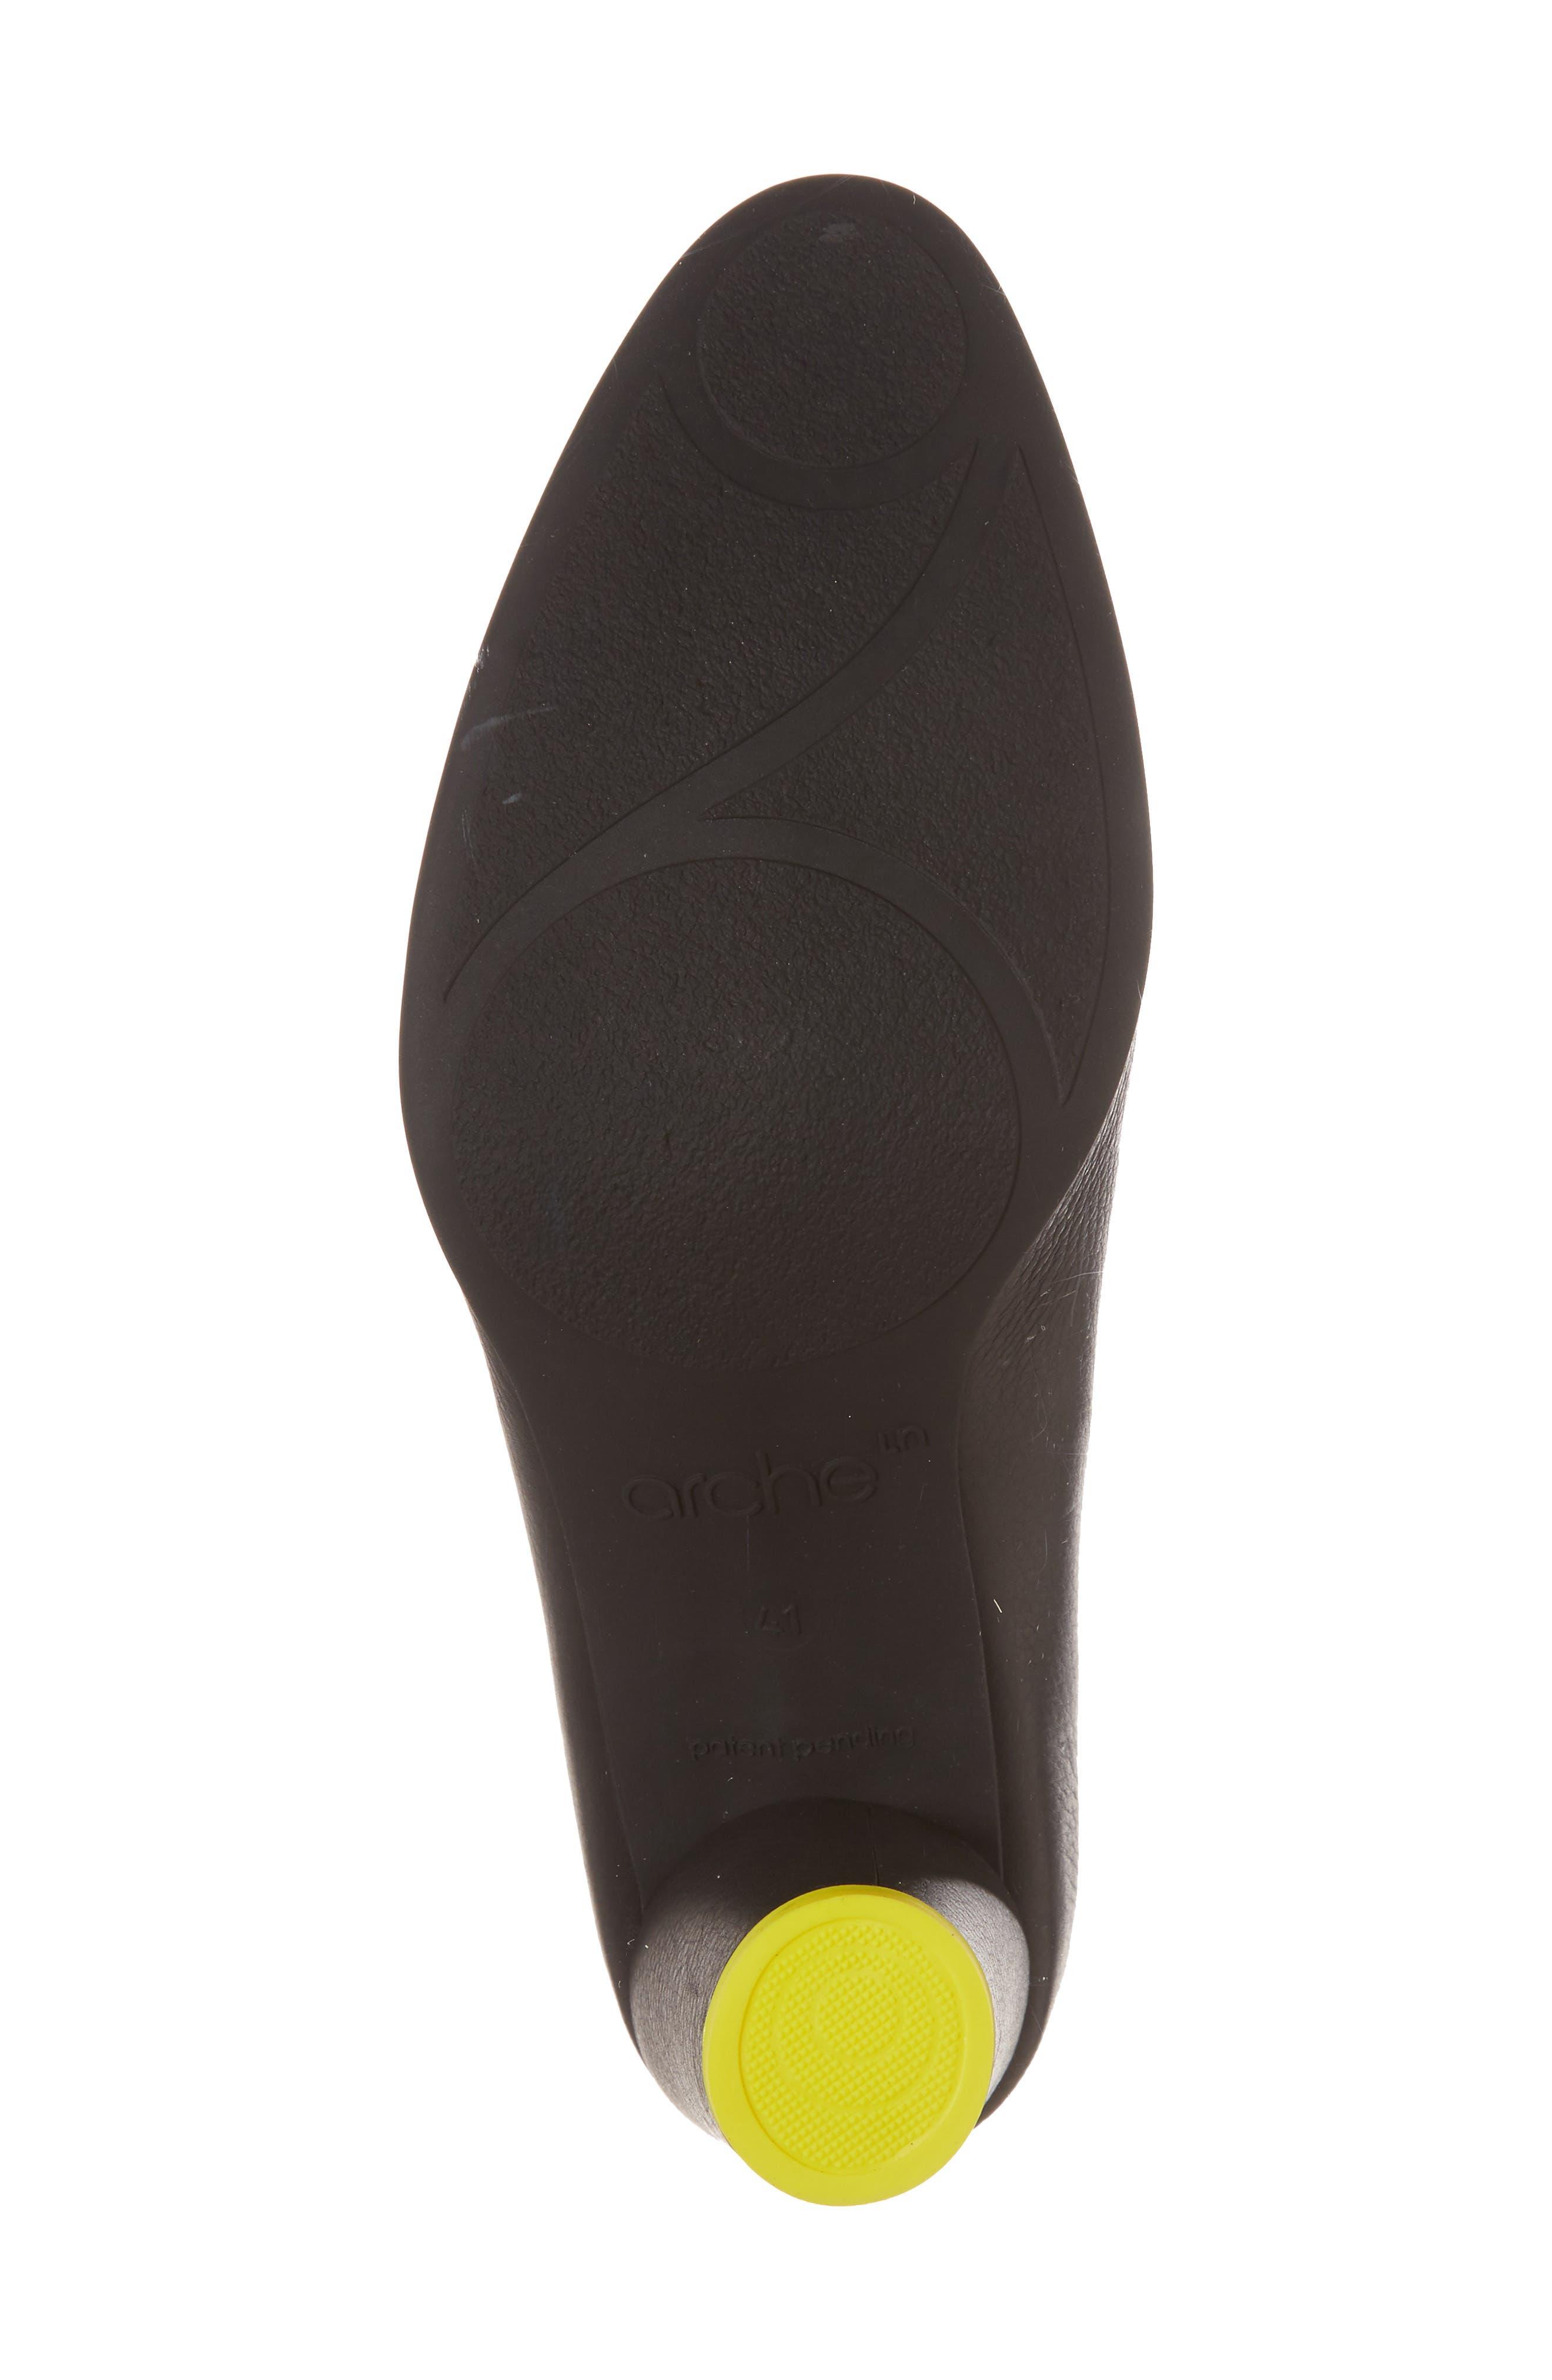 Kloemi Pump,                             Alternate thumbnail 6, color,                             Noir/ Mimosa Leather